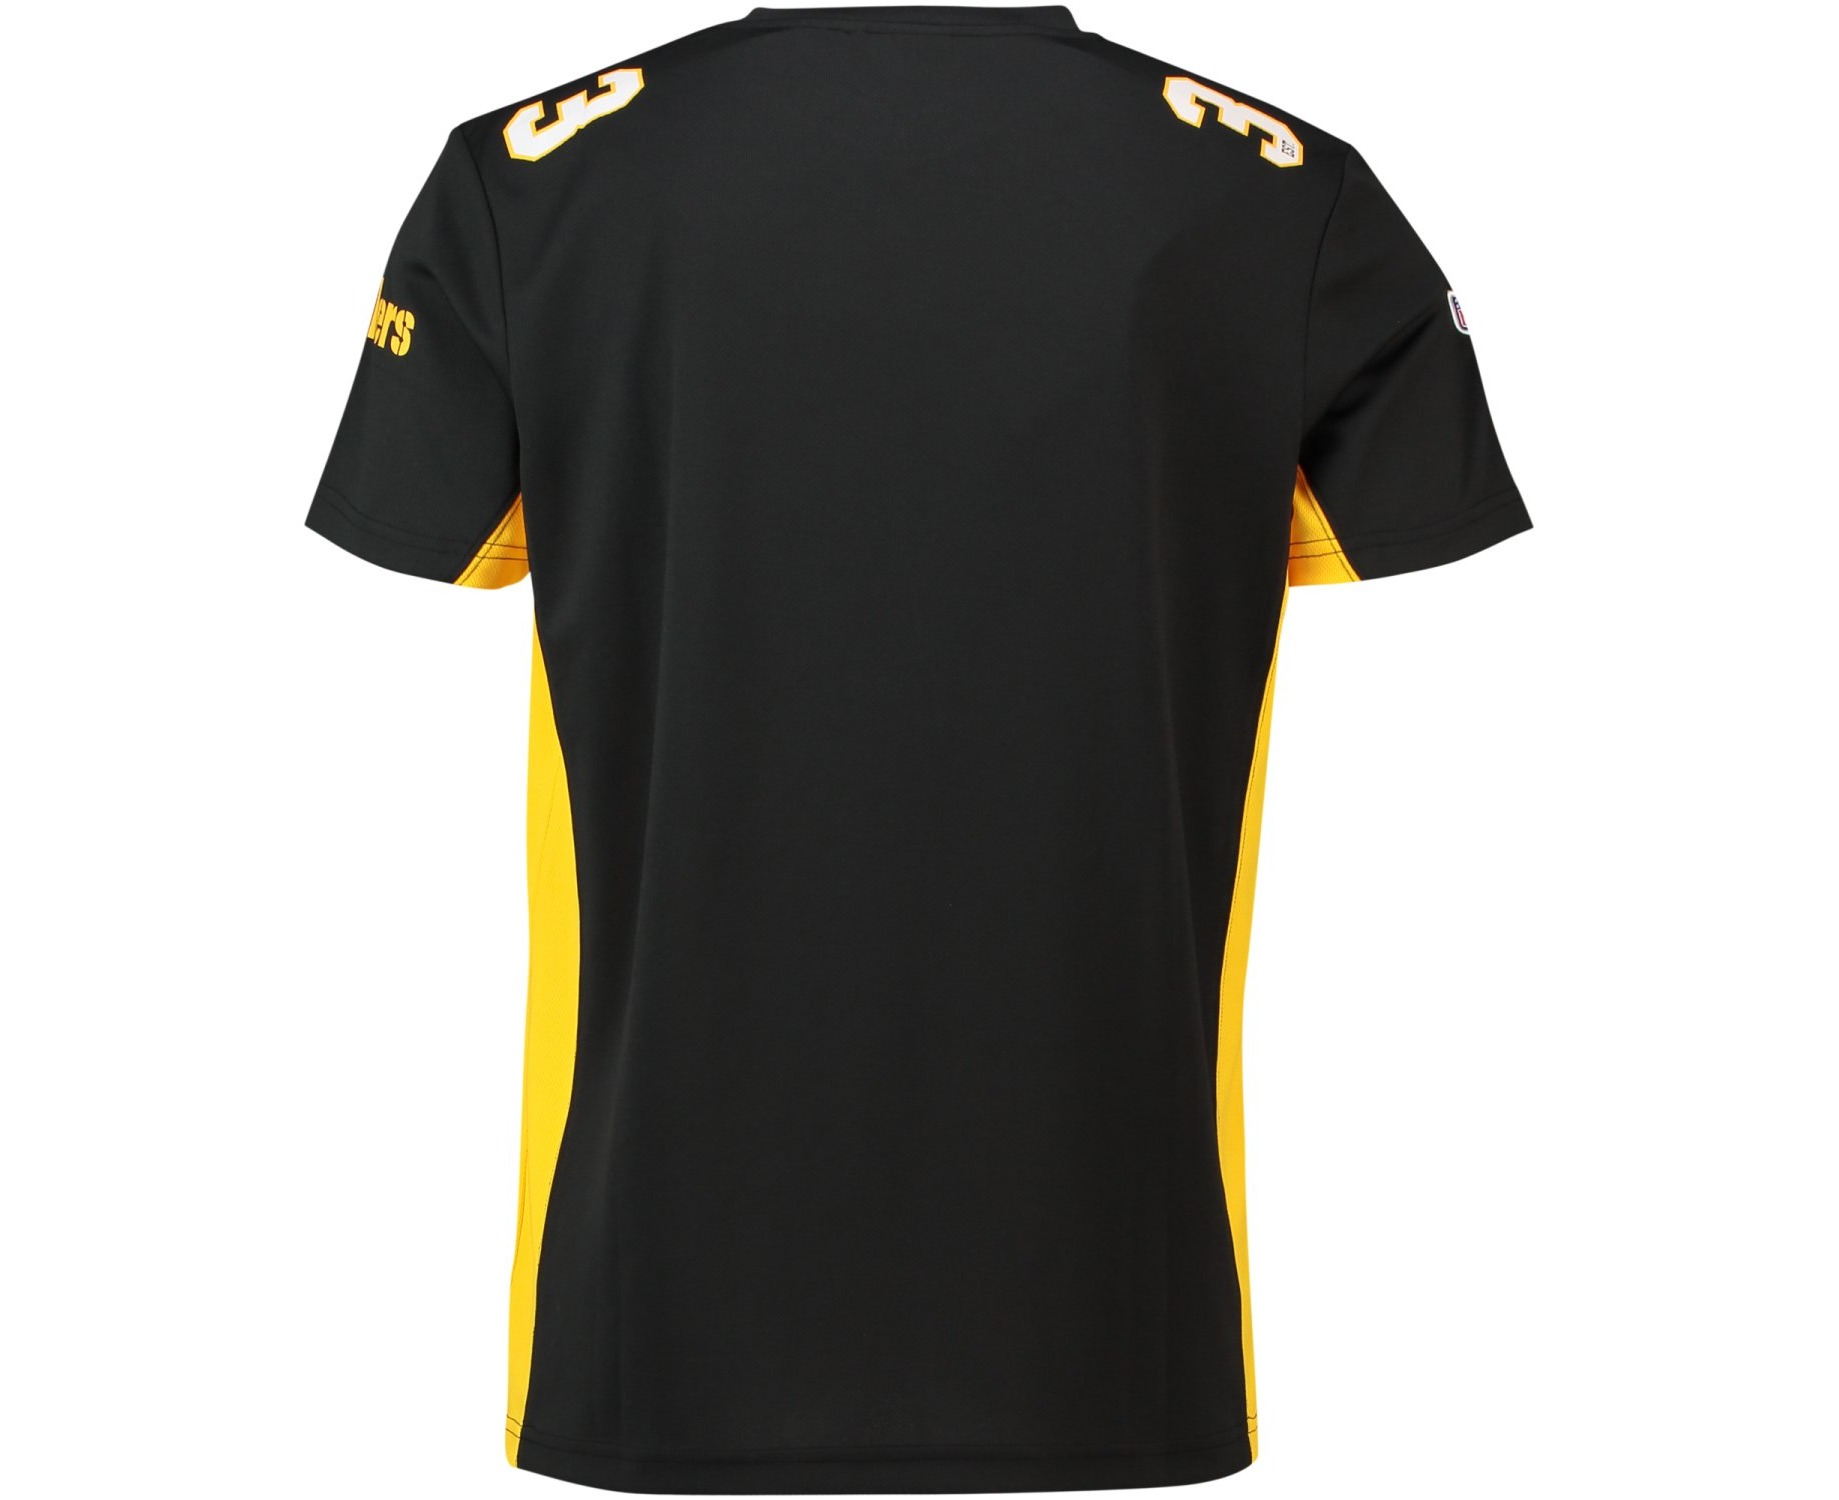 3b44ce9ab2b7f Majestic NFL MORO Polymesh Jersey Shirt Pittsburgh Steelers